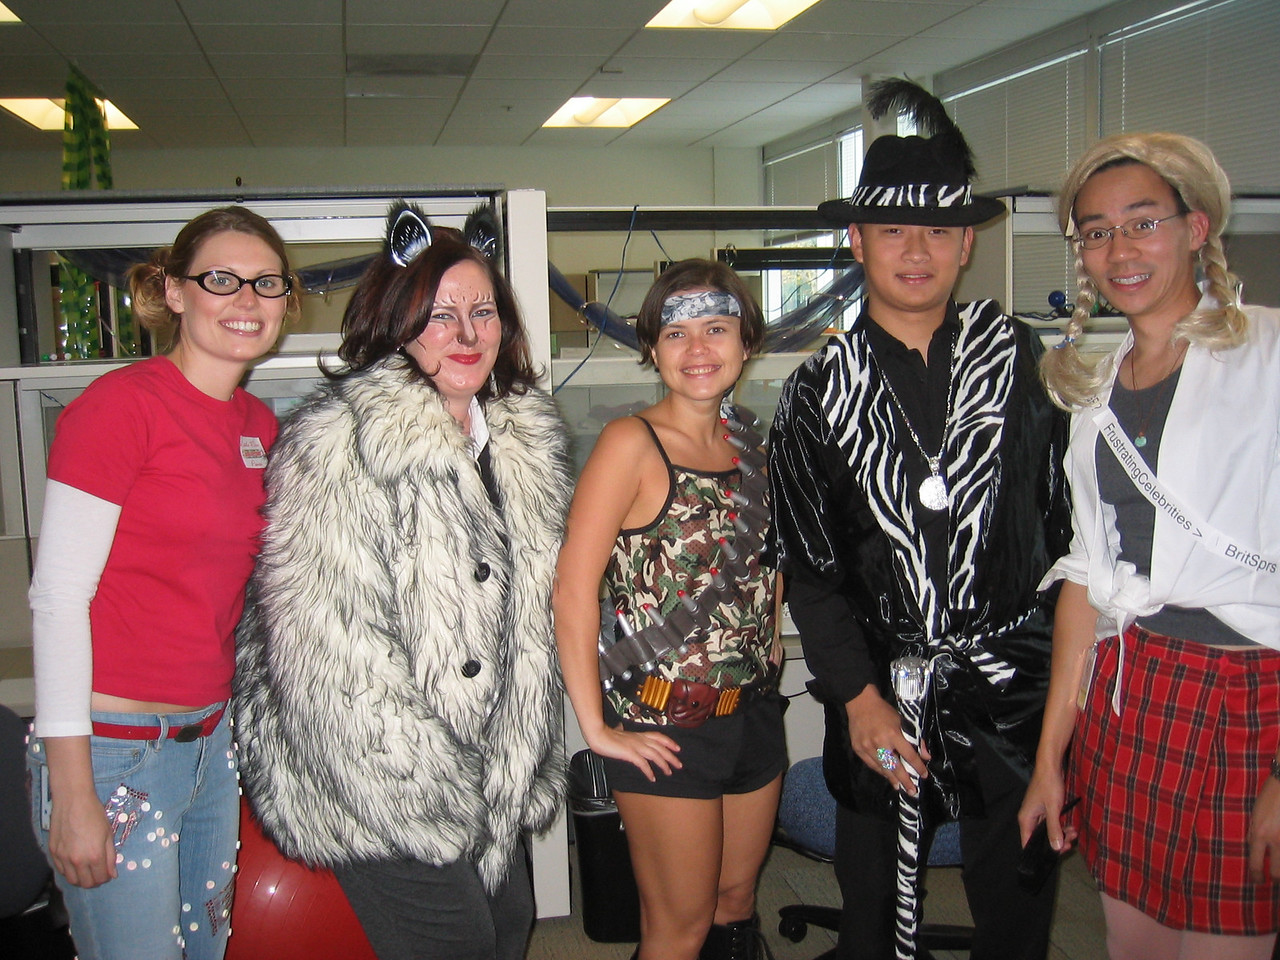 2004 10 29 Friday - Kelly, Laura, Jonika, David, & Britney Halloween costumes @ Google